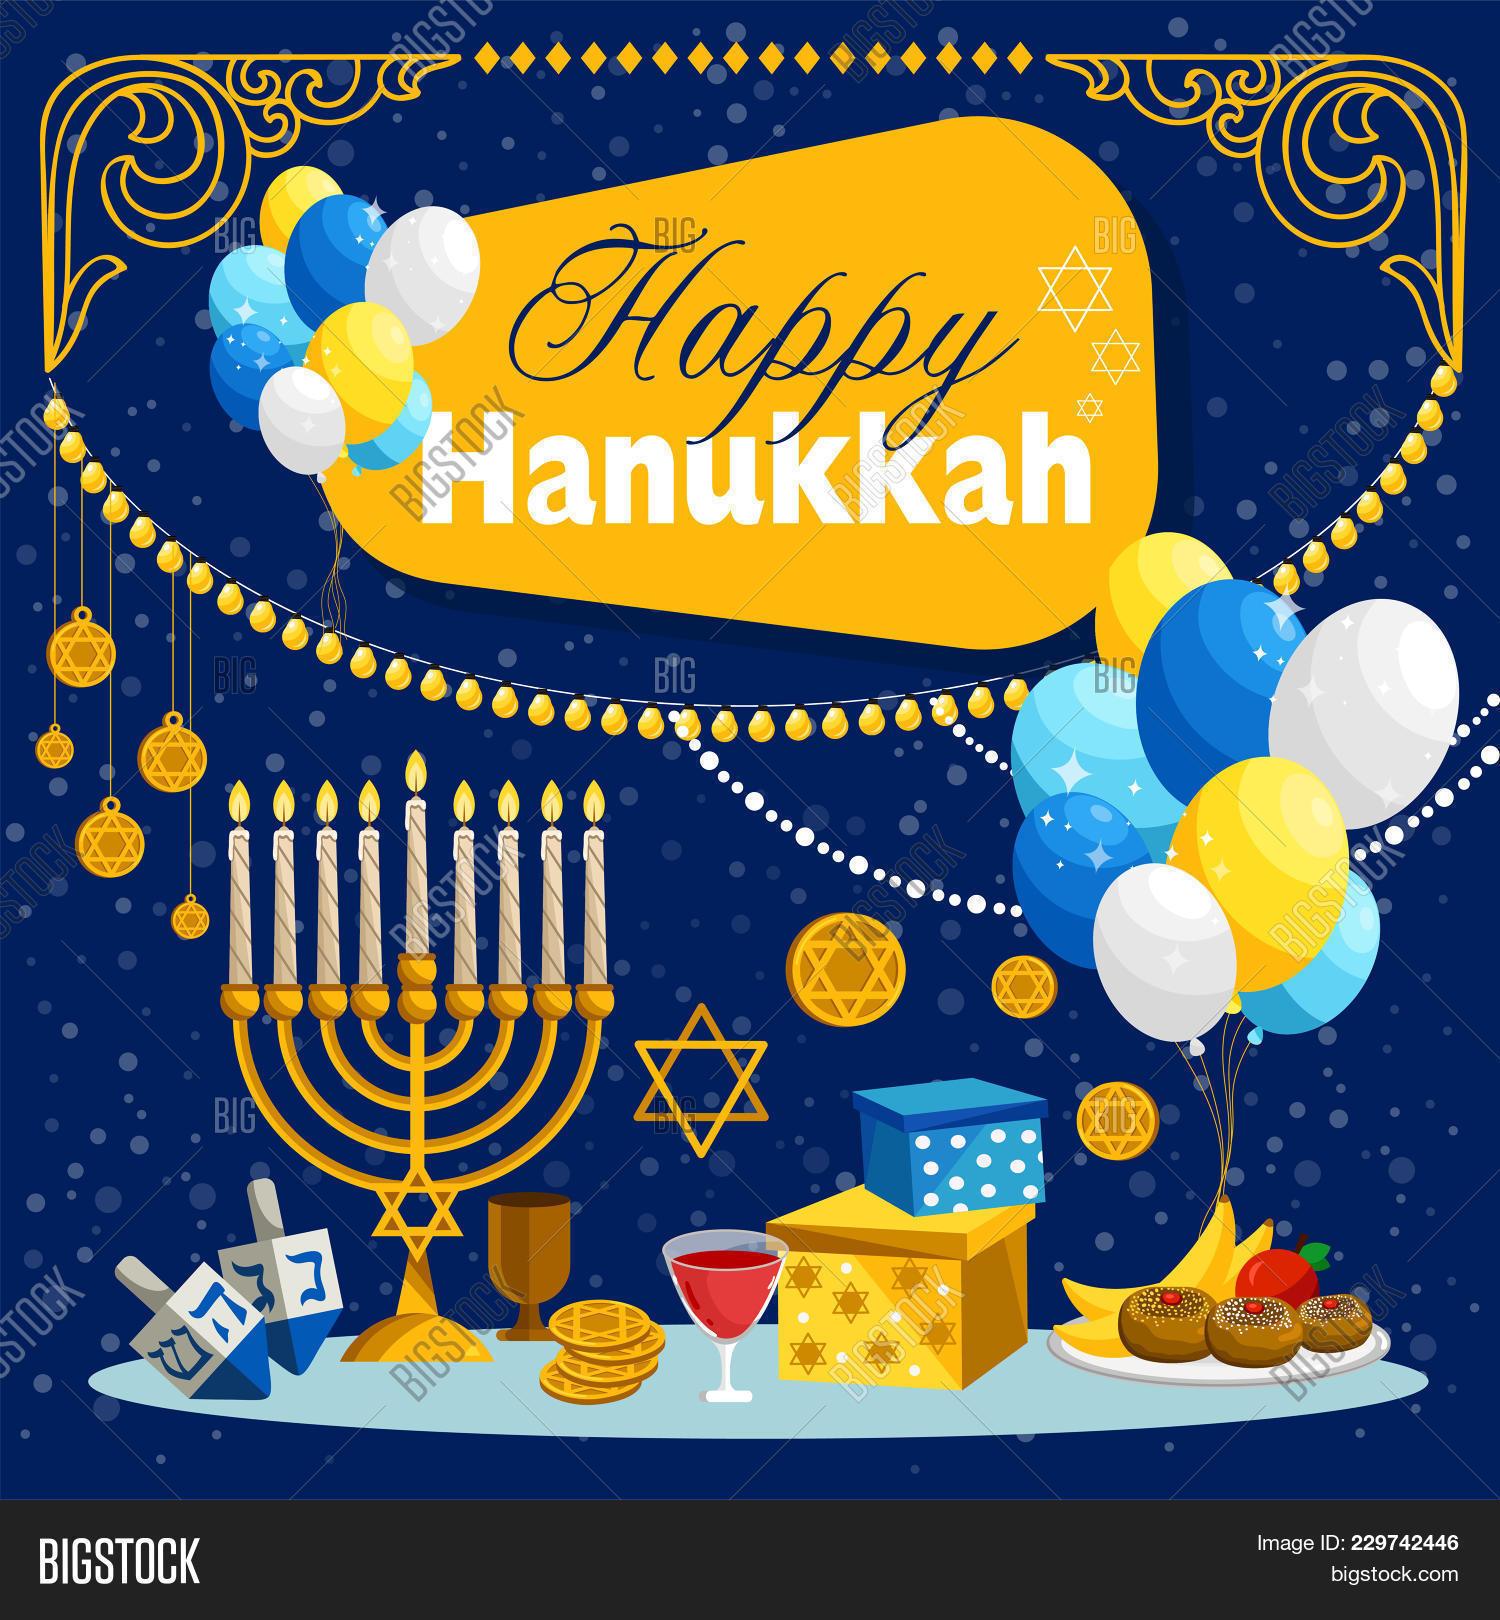 Happy Hanukkah Holiday Image Photo Free Trial Bigstock